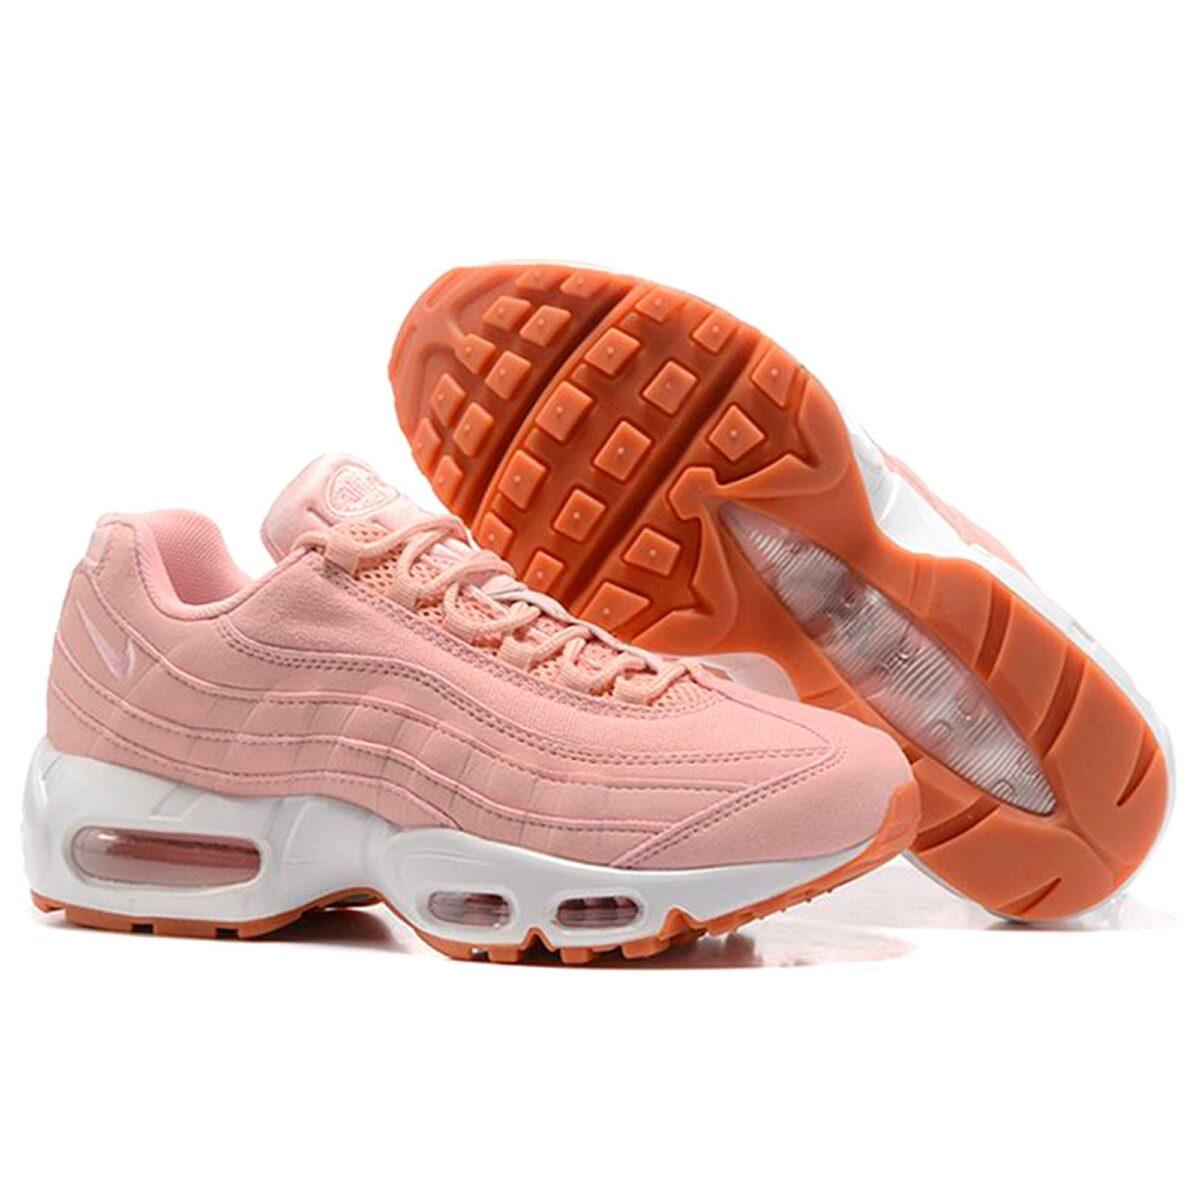 nike air max 95 pink 919924_600 купить